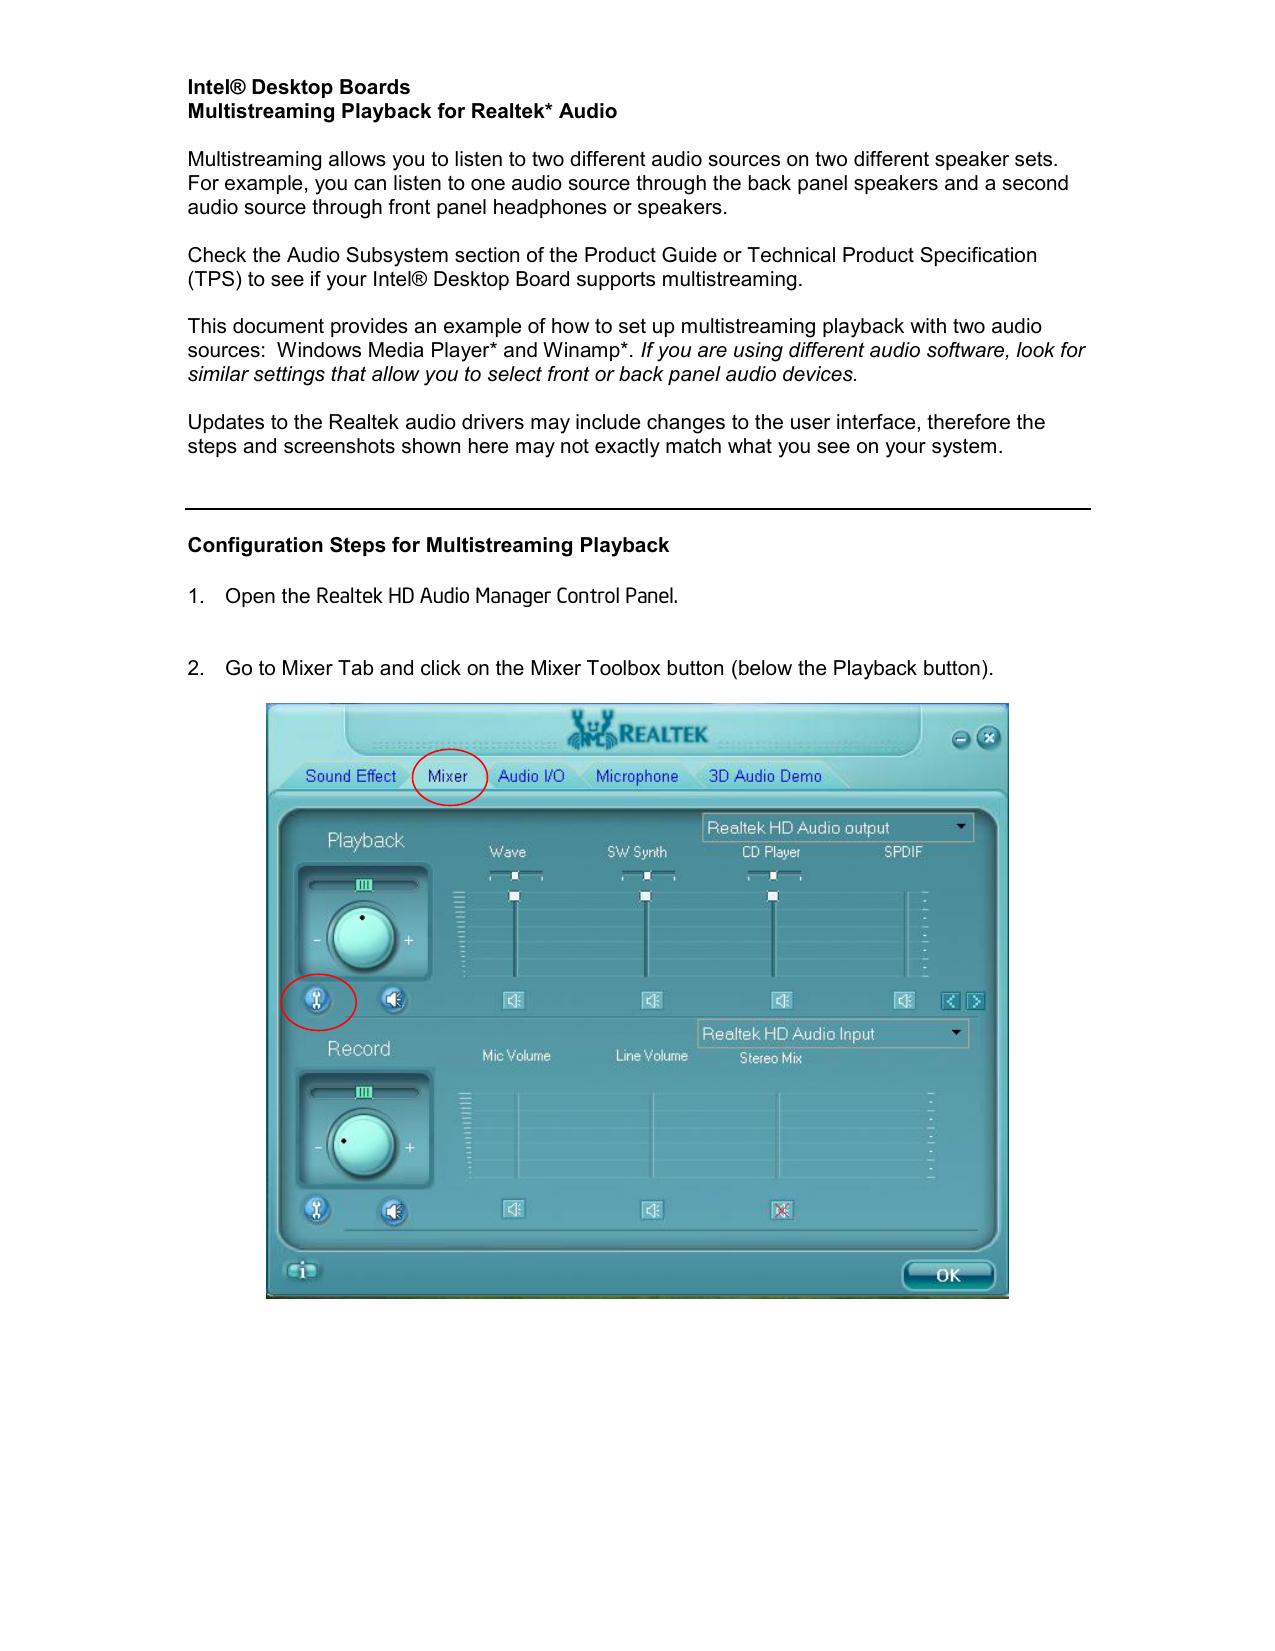 Intel® Desktop Boards Multistreaming Playback for Realtek